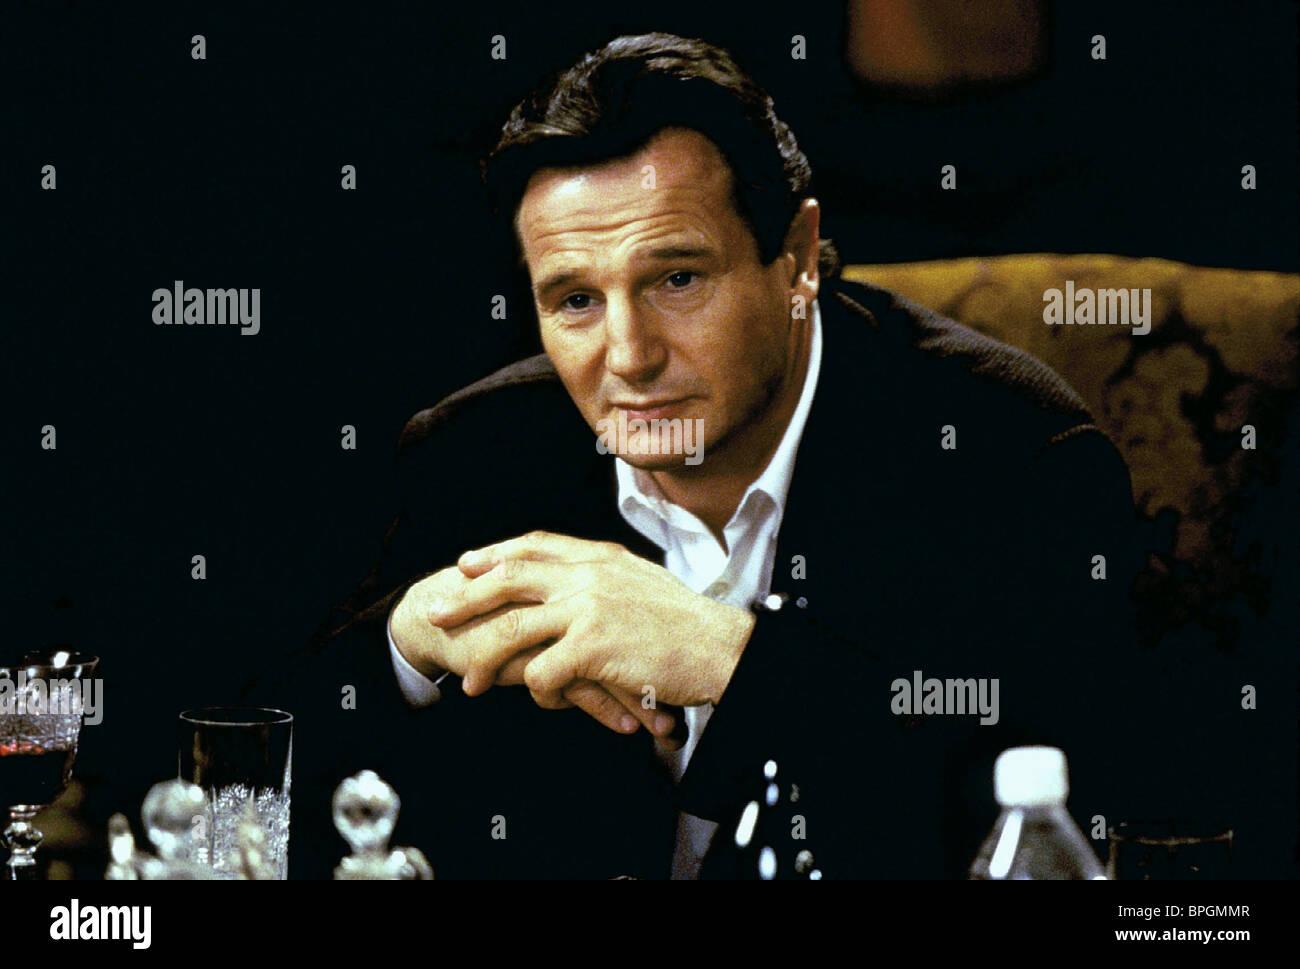 LIAM NEESON THE HAUNTING (1999) - Stock Image